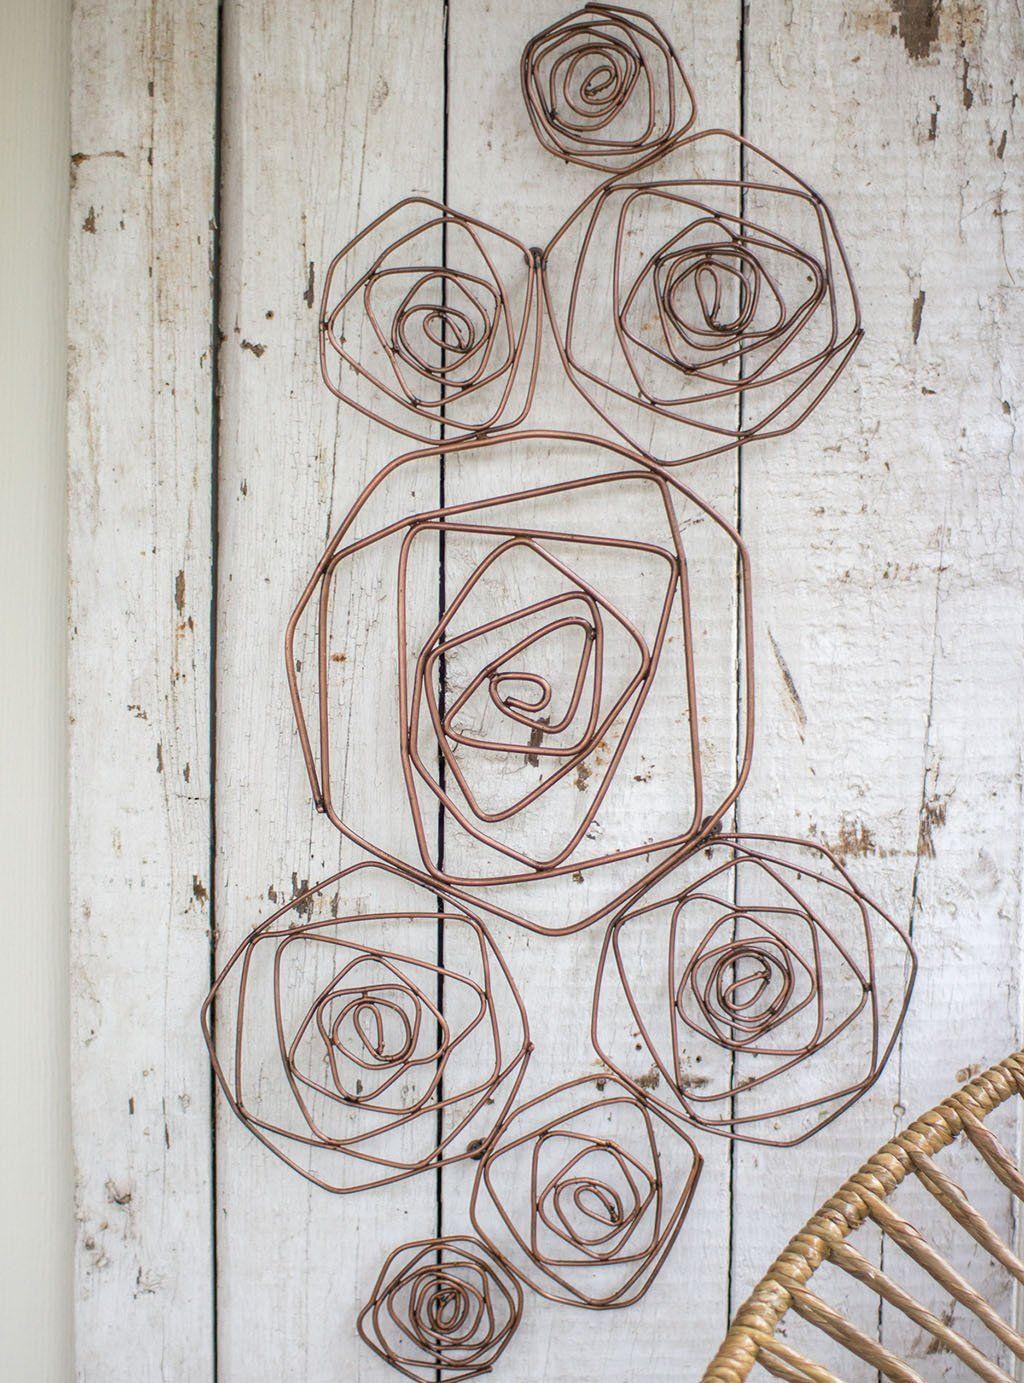 Rose Wall Sculpture | Pinterest | Wall sculptures, Rose and Walls